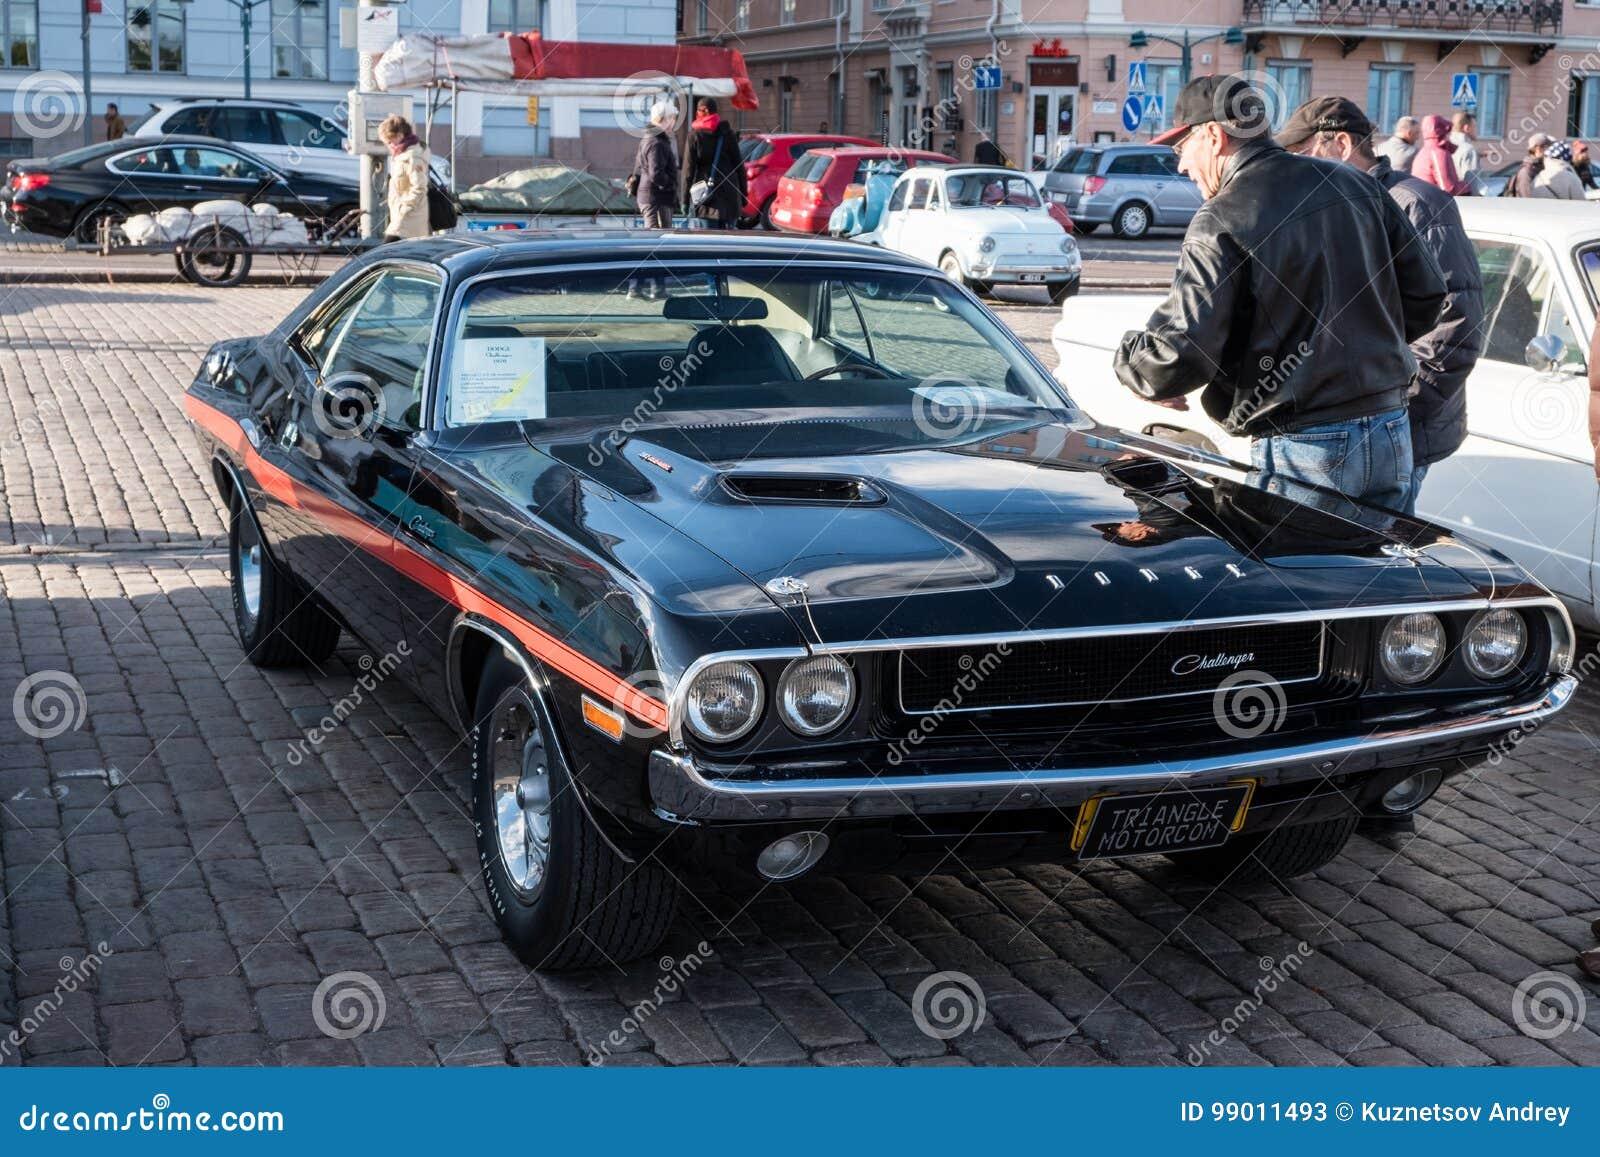 Helsinki Finland Old Car Dodge Challenger Editorial Stock Photo